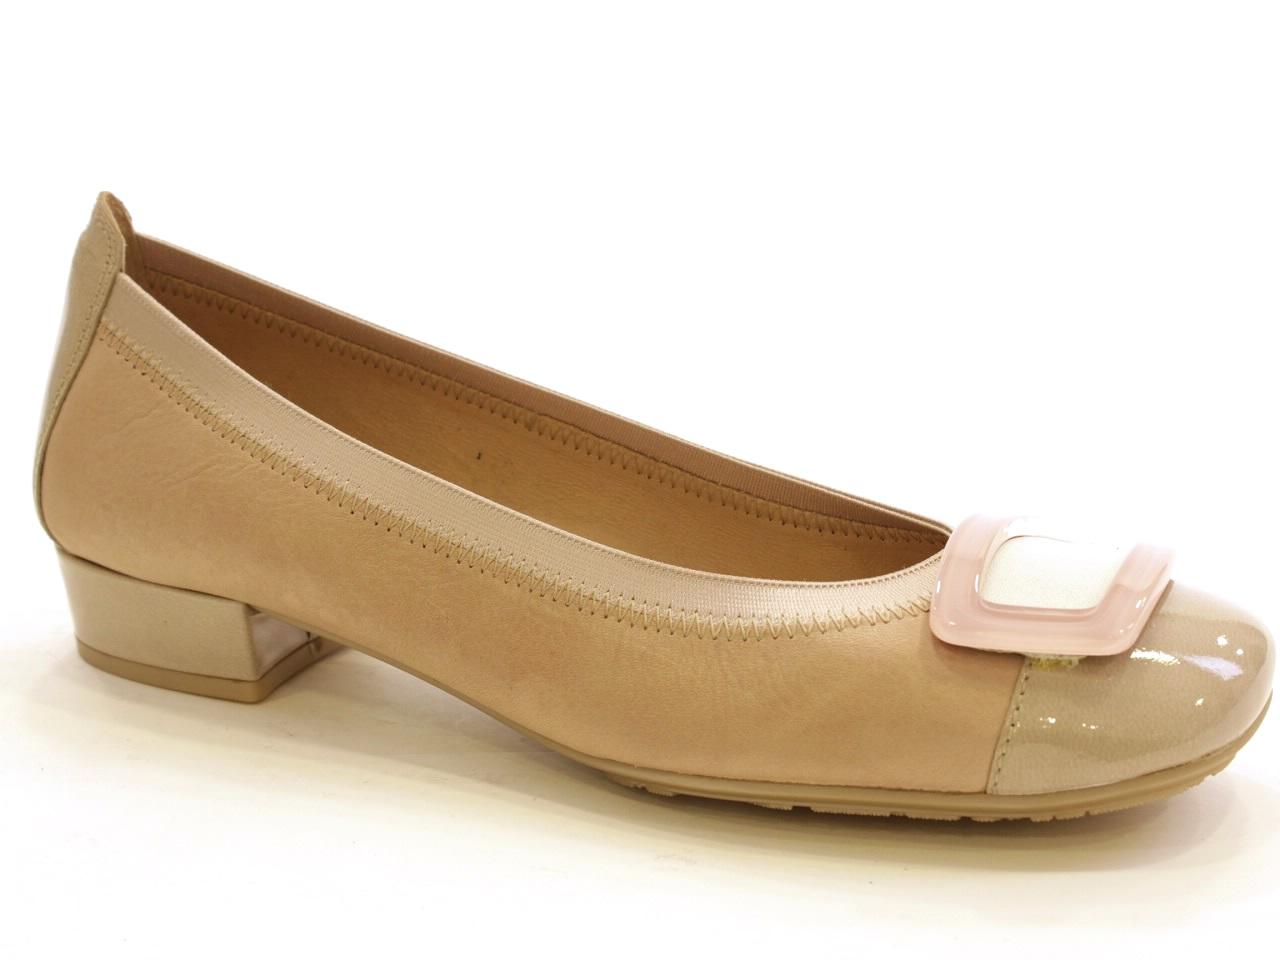 Chaussures Plates, Ballerine, Mocassins Hispanitas - 165 CHV49846